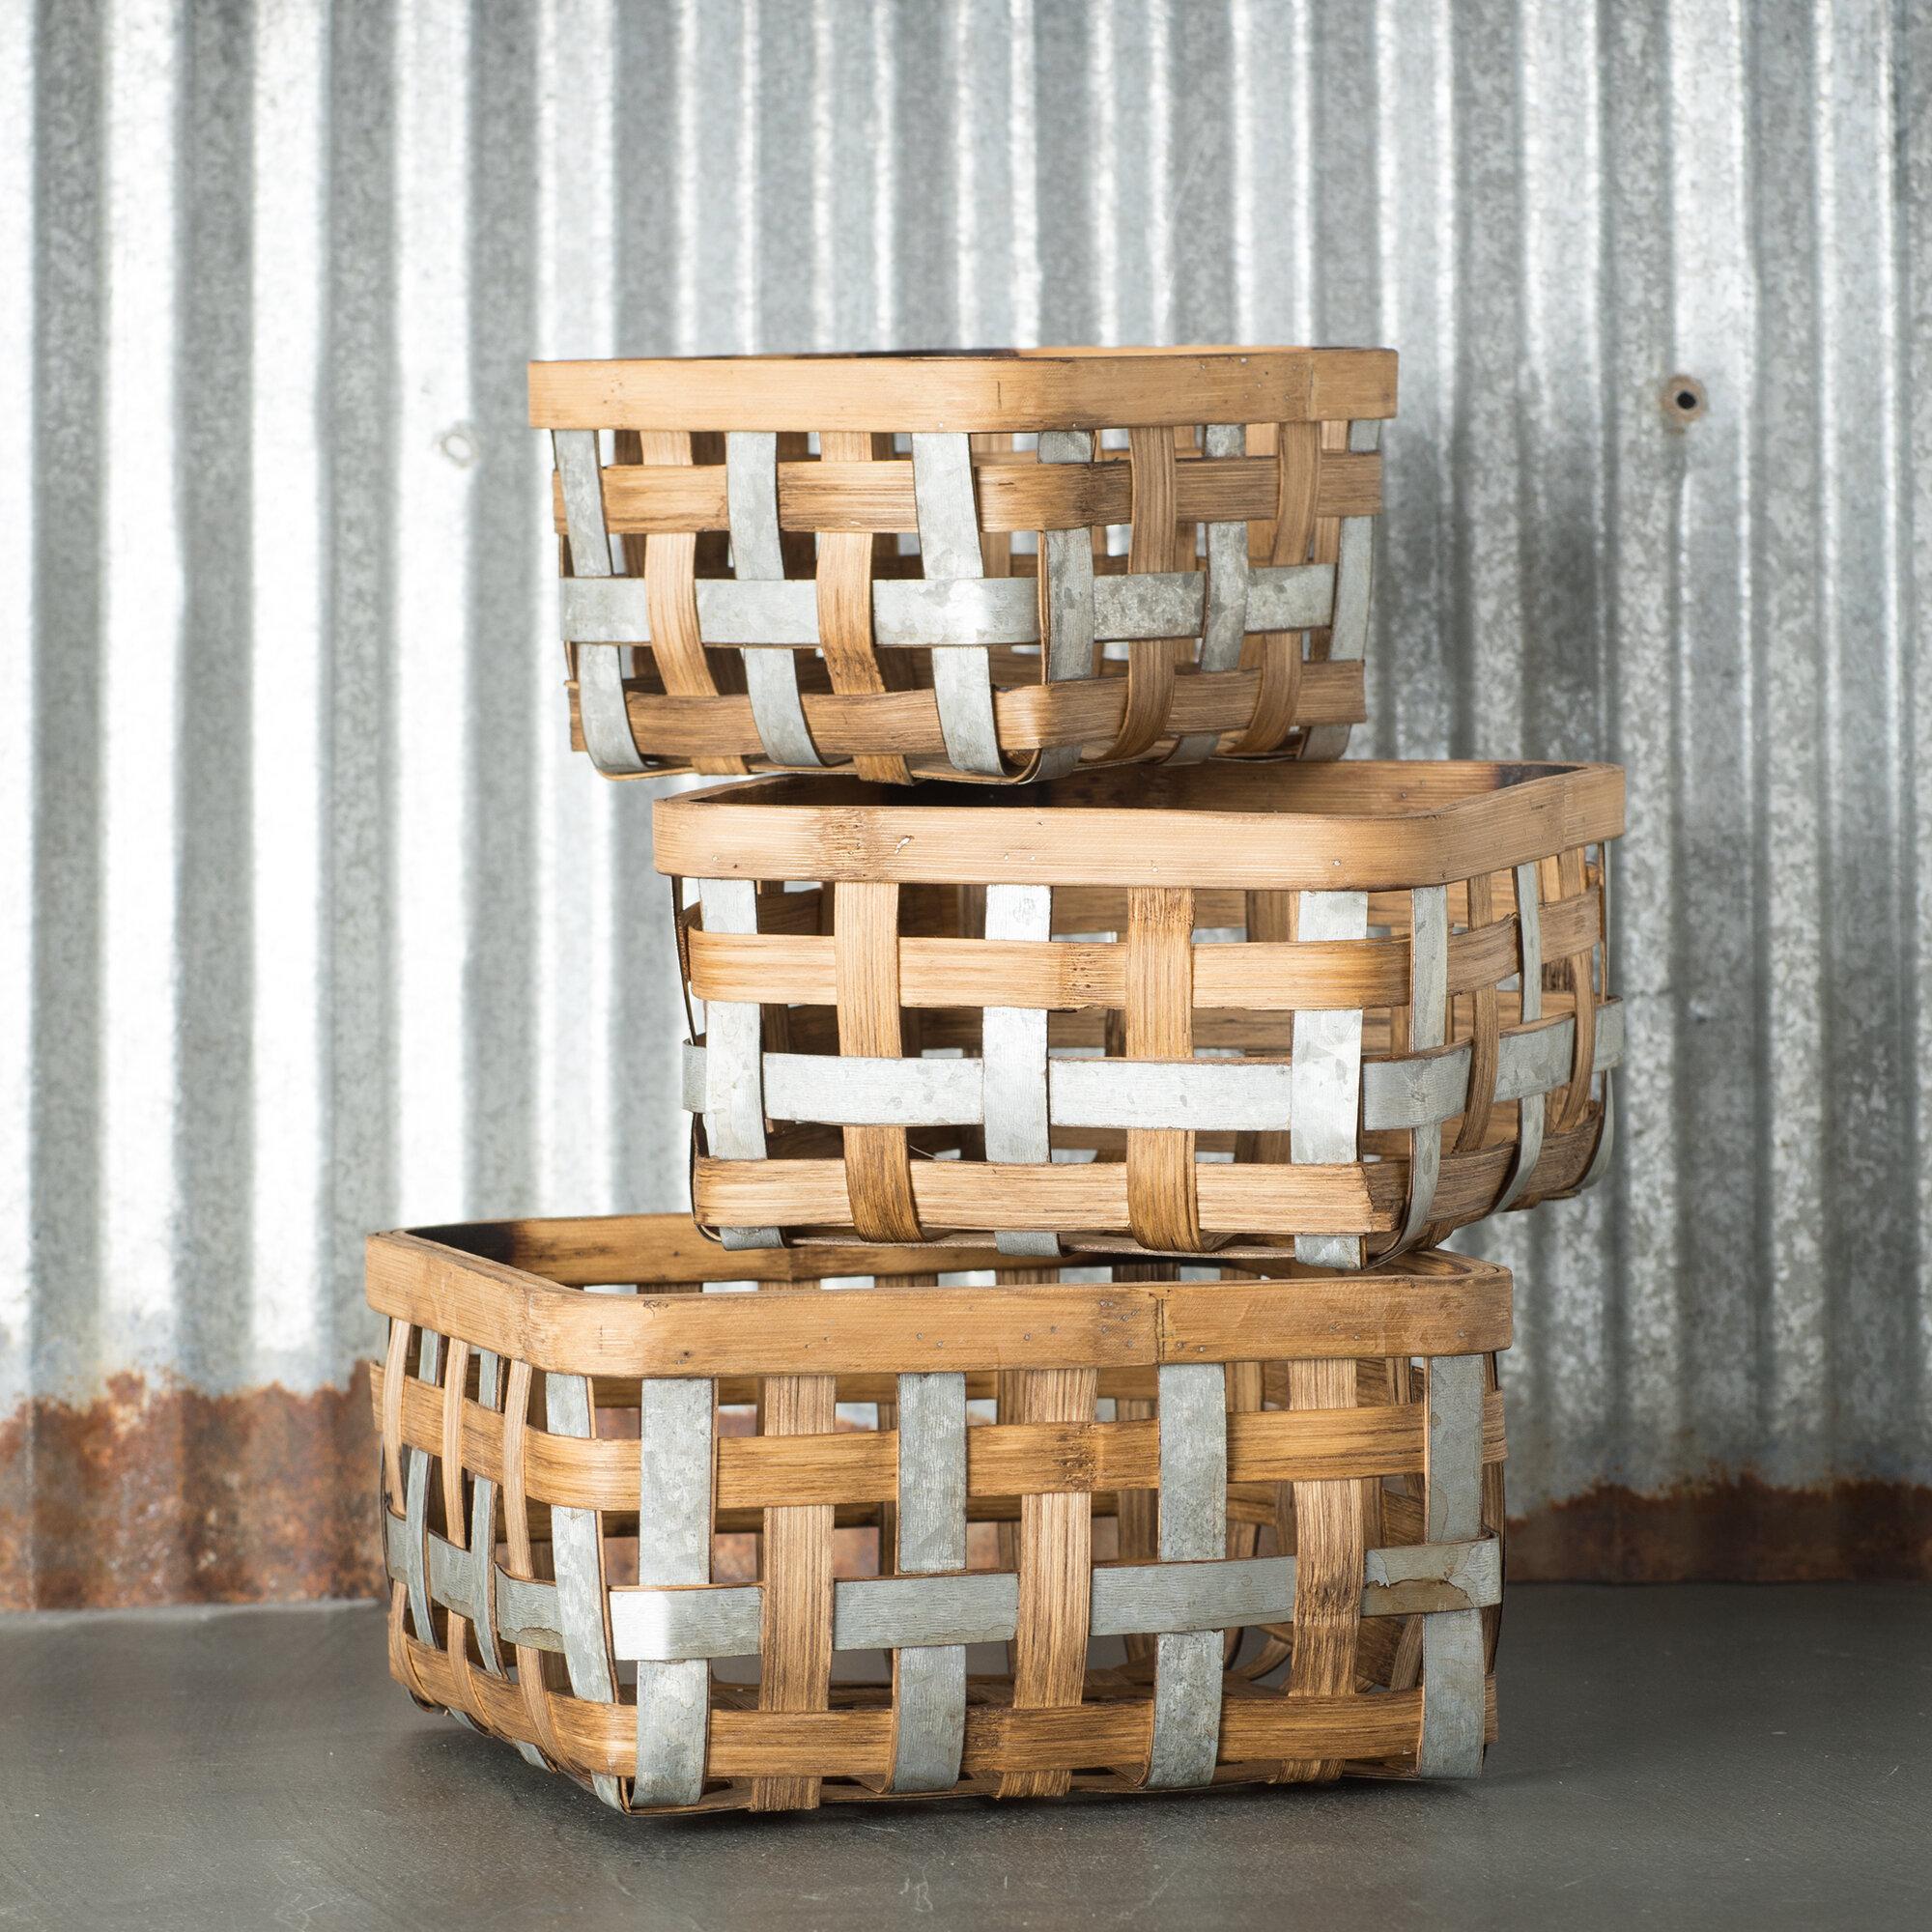 Gracie Oaks Bushel 3 Piece Bamboo Basket Set Reviews Wayfair